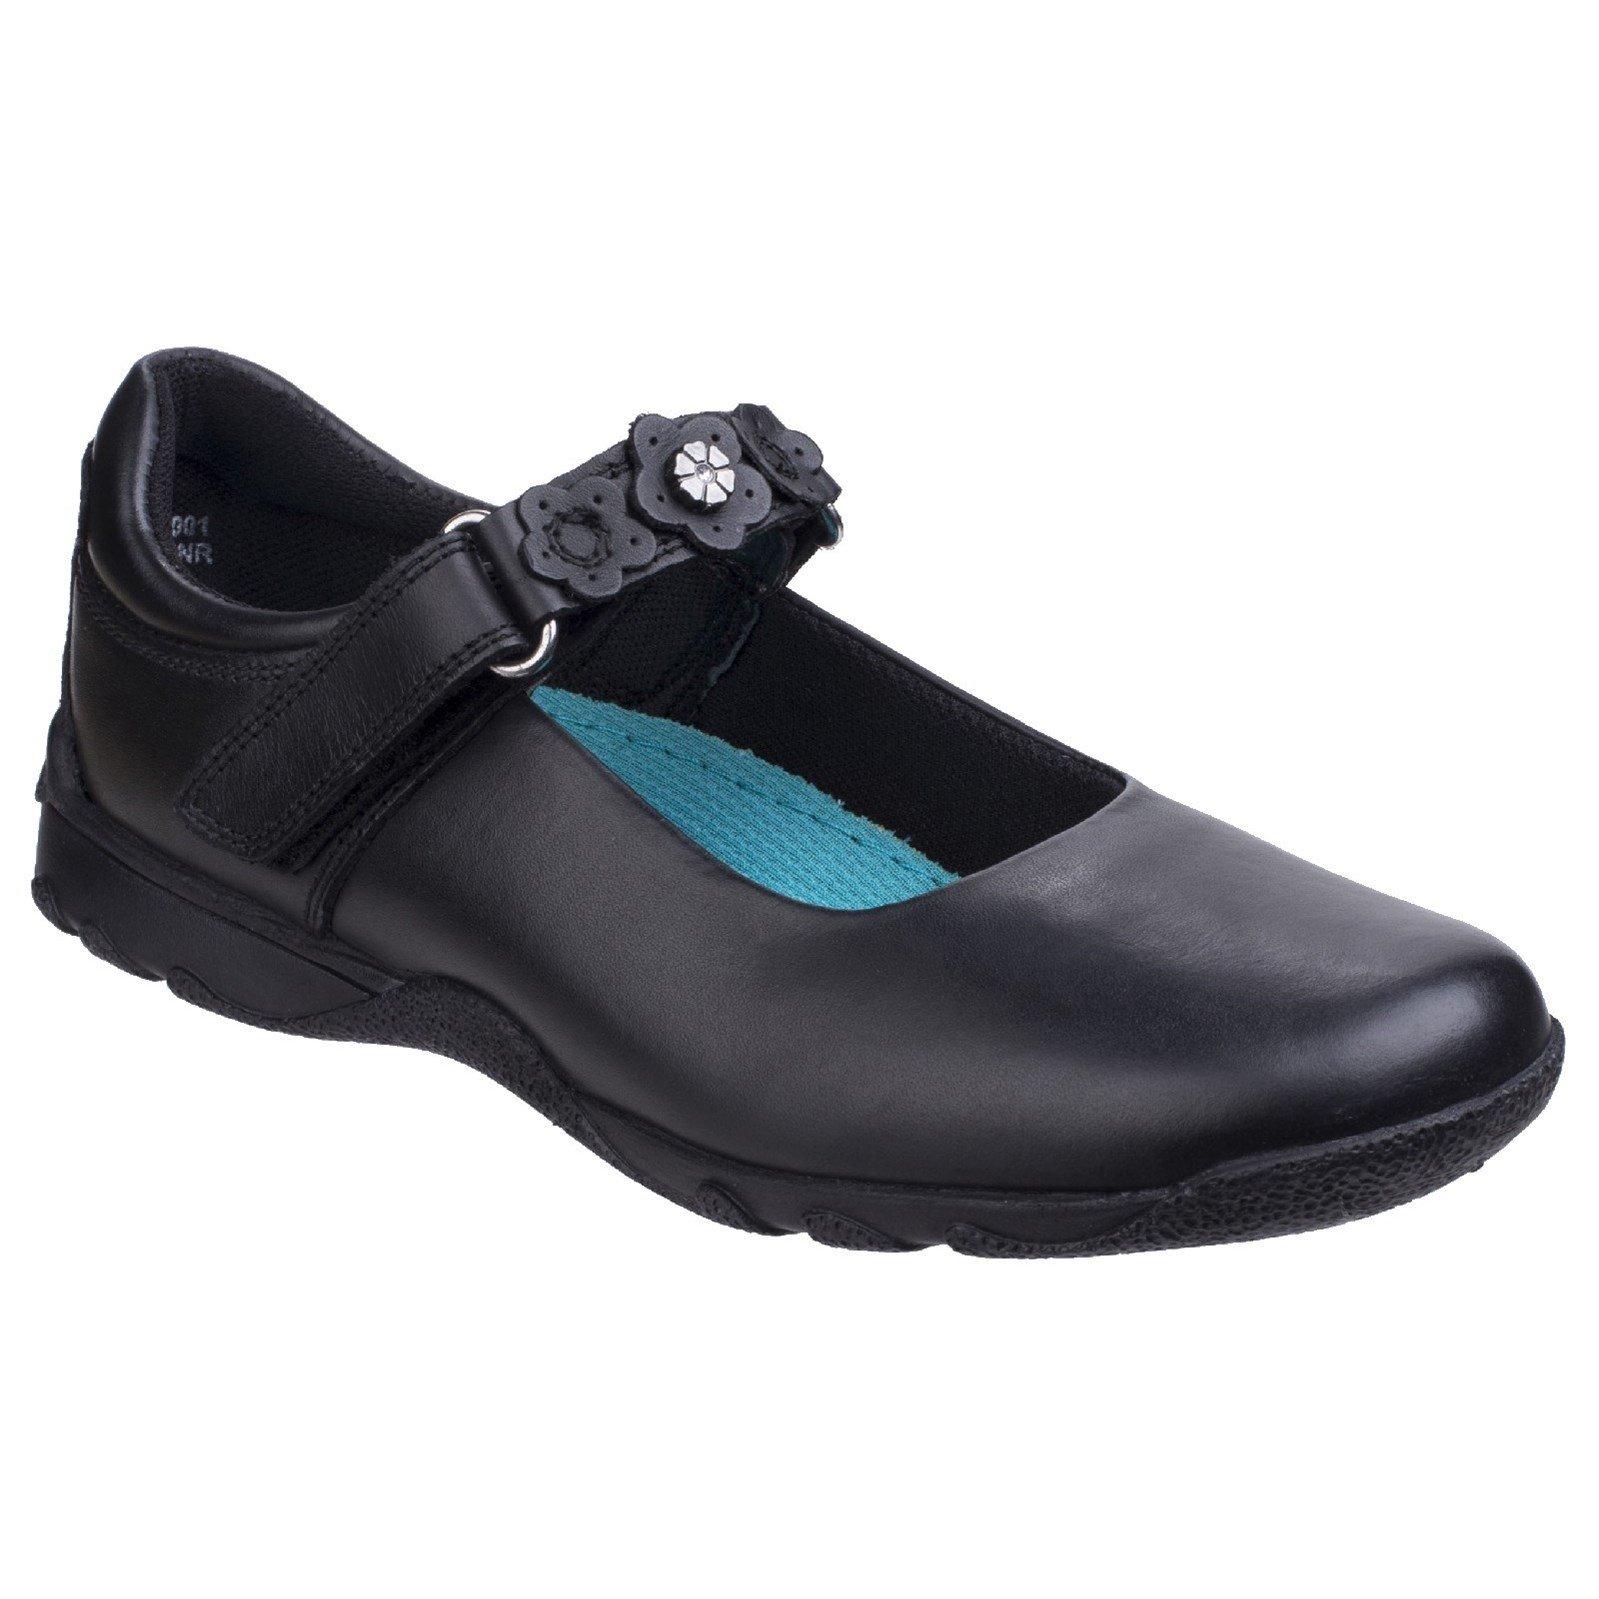 Boots SAUTE STYLES Kids Boys Girls Velcro Strap Slip On